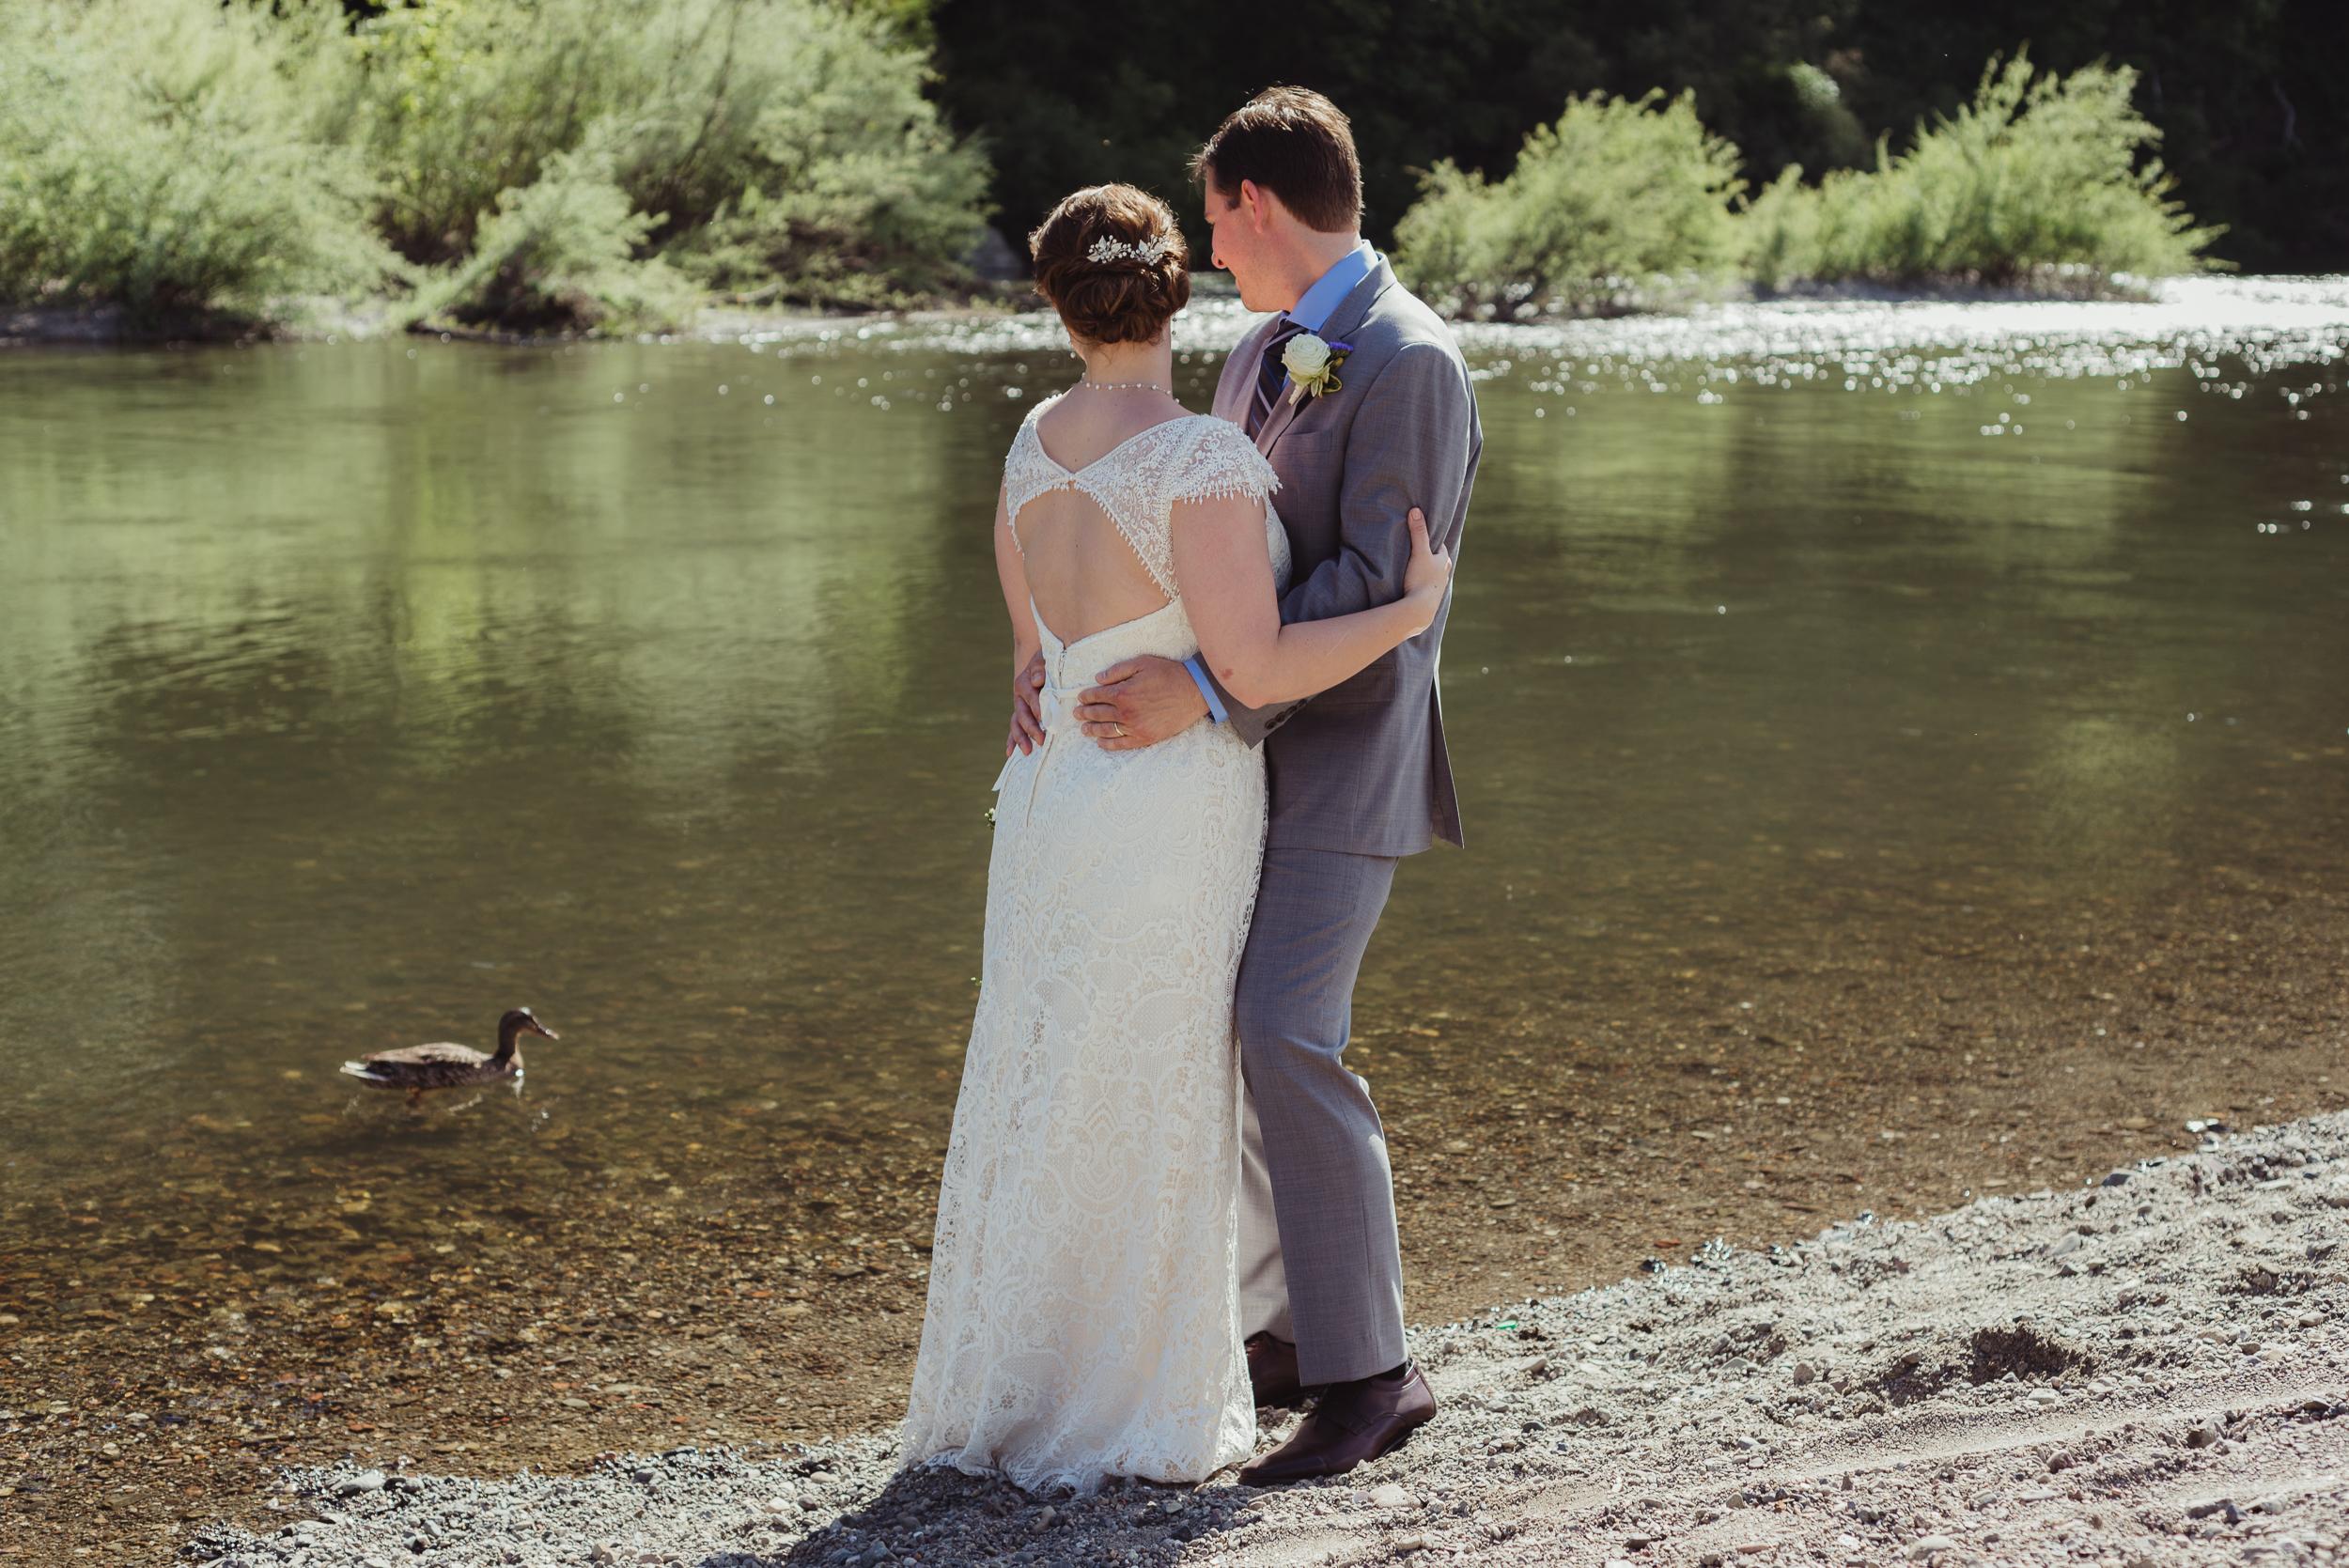 056-highland-dell-lodge-russian-river-wedding-vivianchen-396.jpg